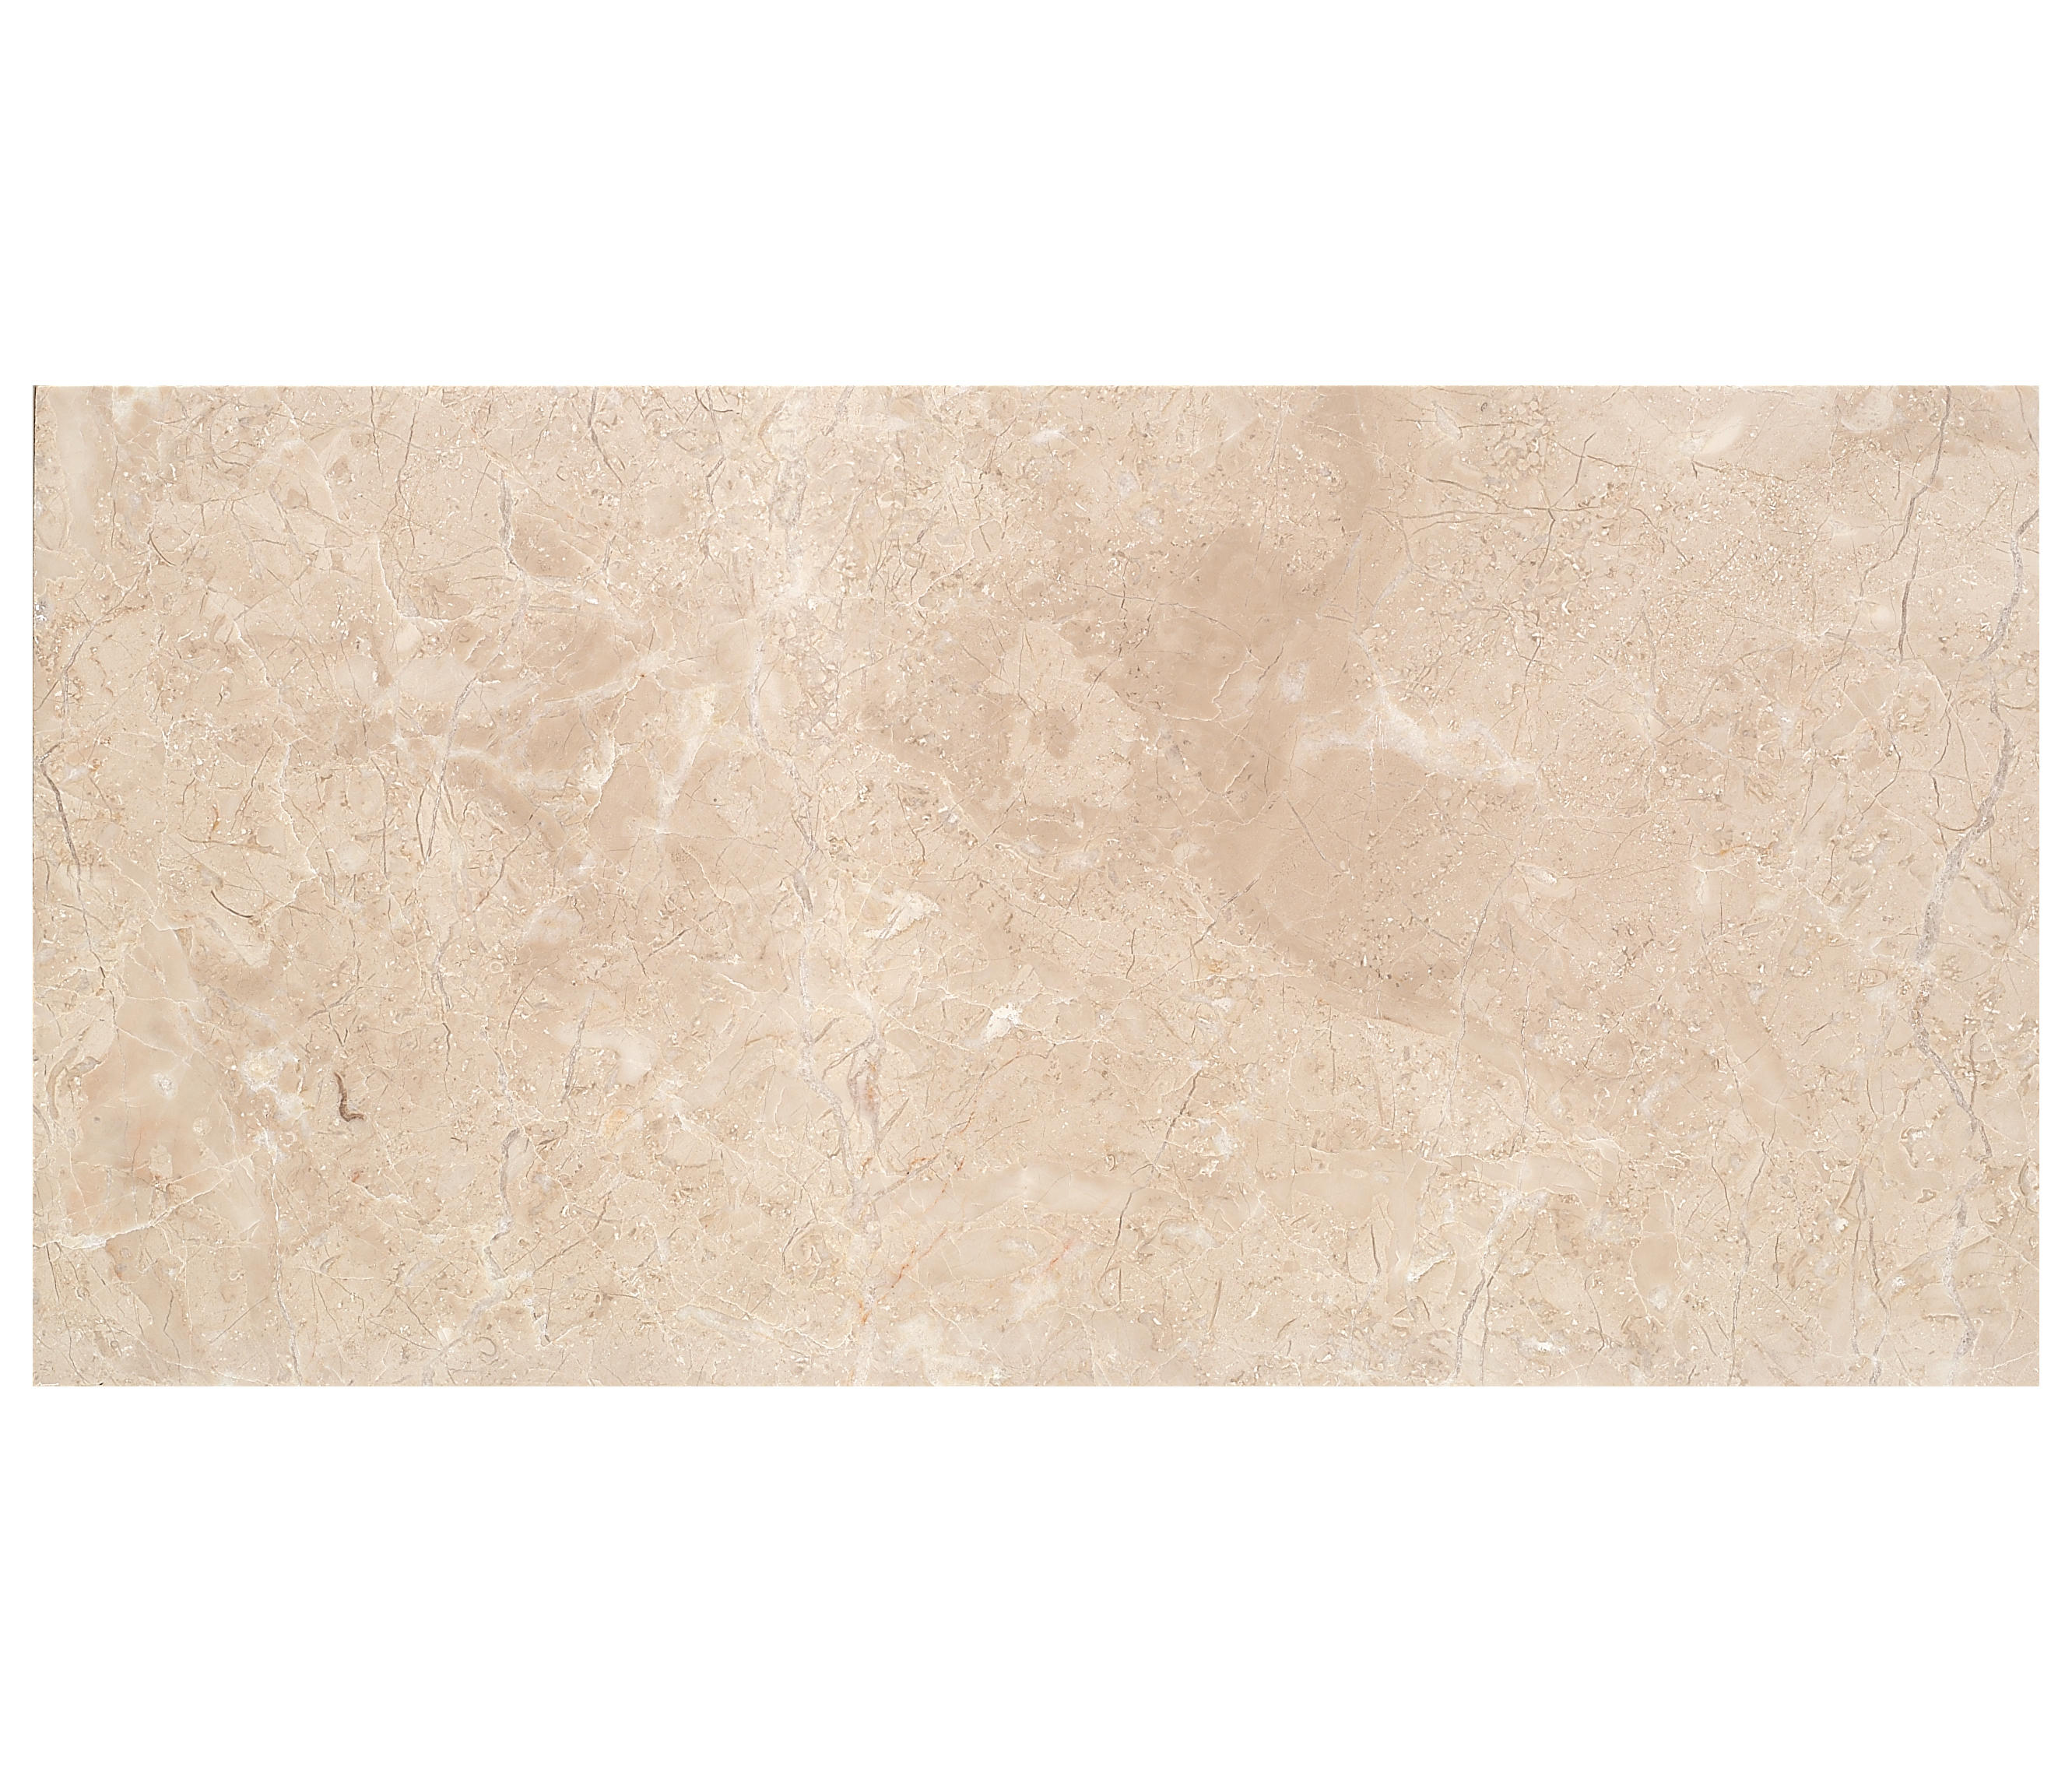 Marmol marmol crema tiles from dune cer mica architonic - Dune ceramica ...